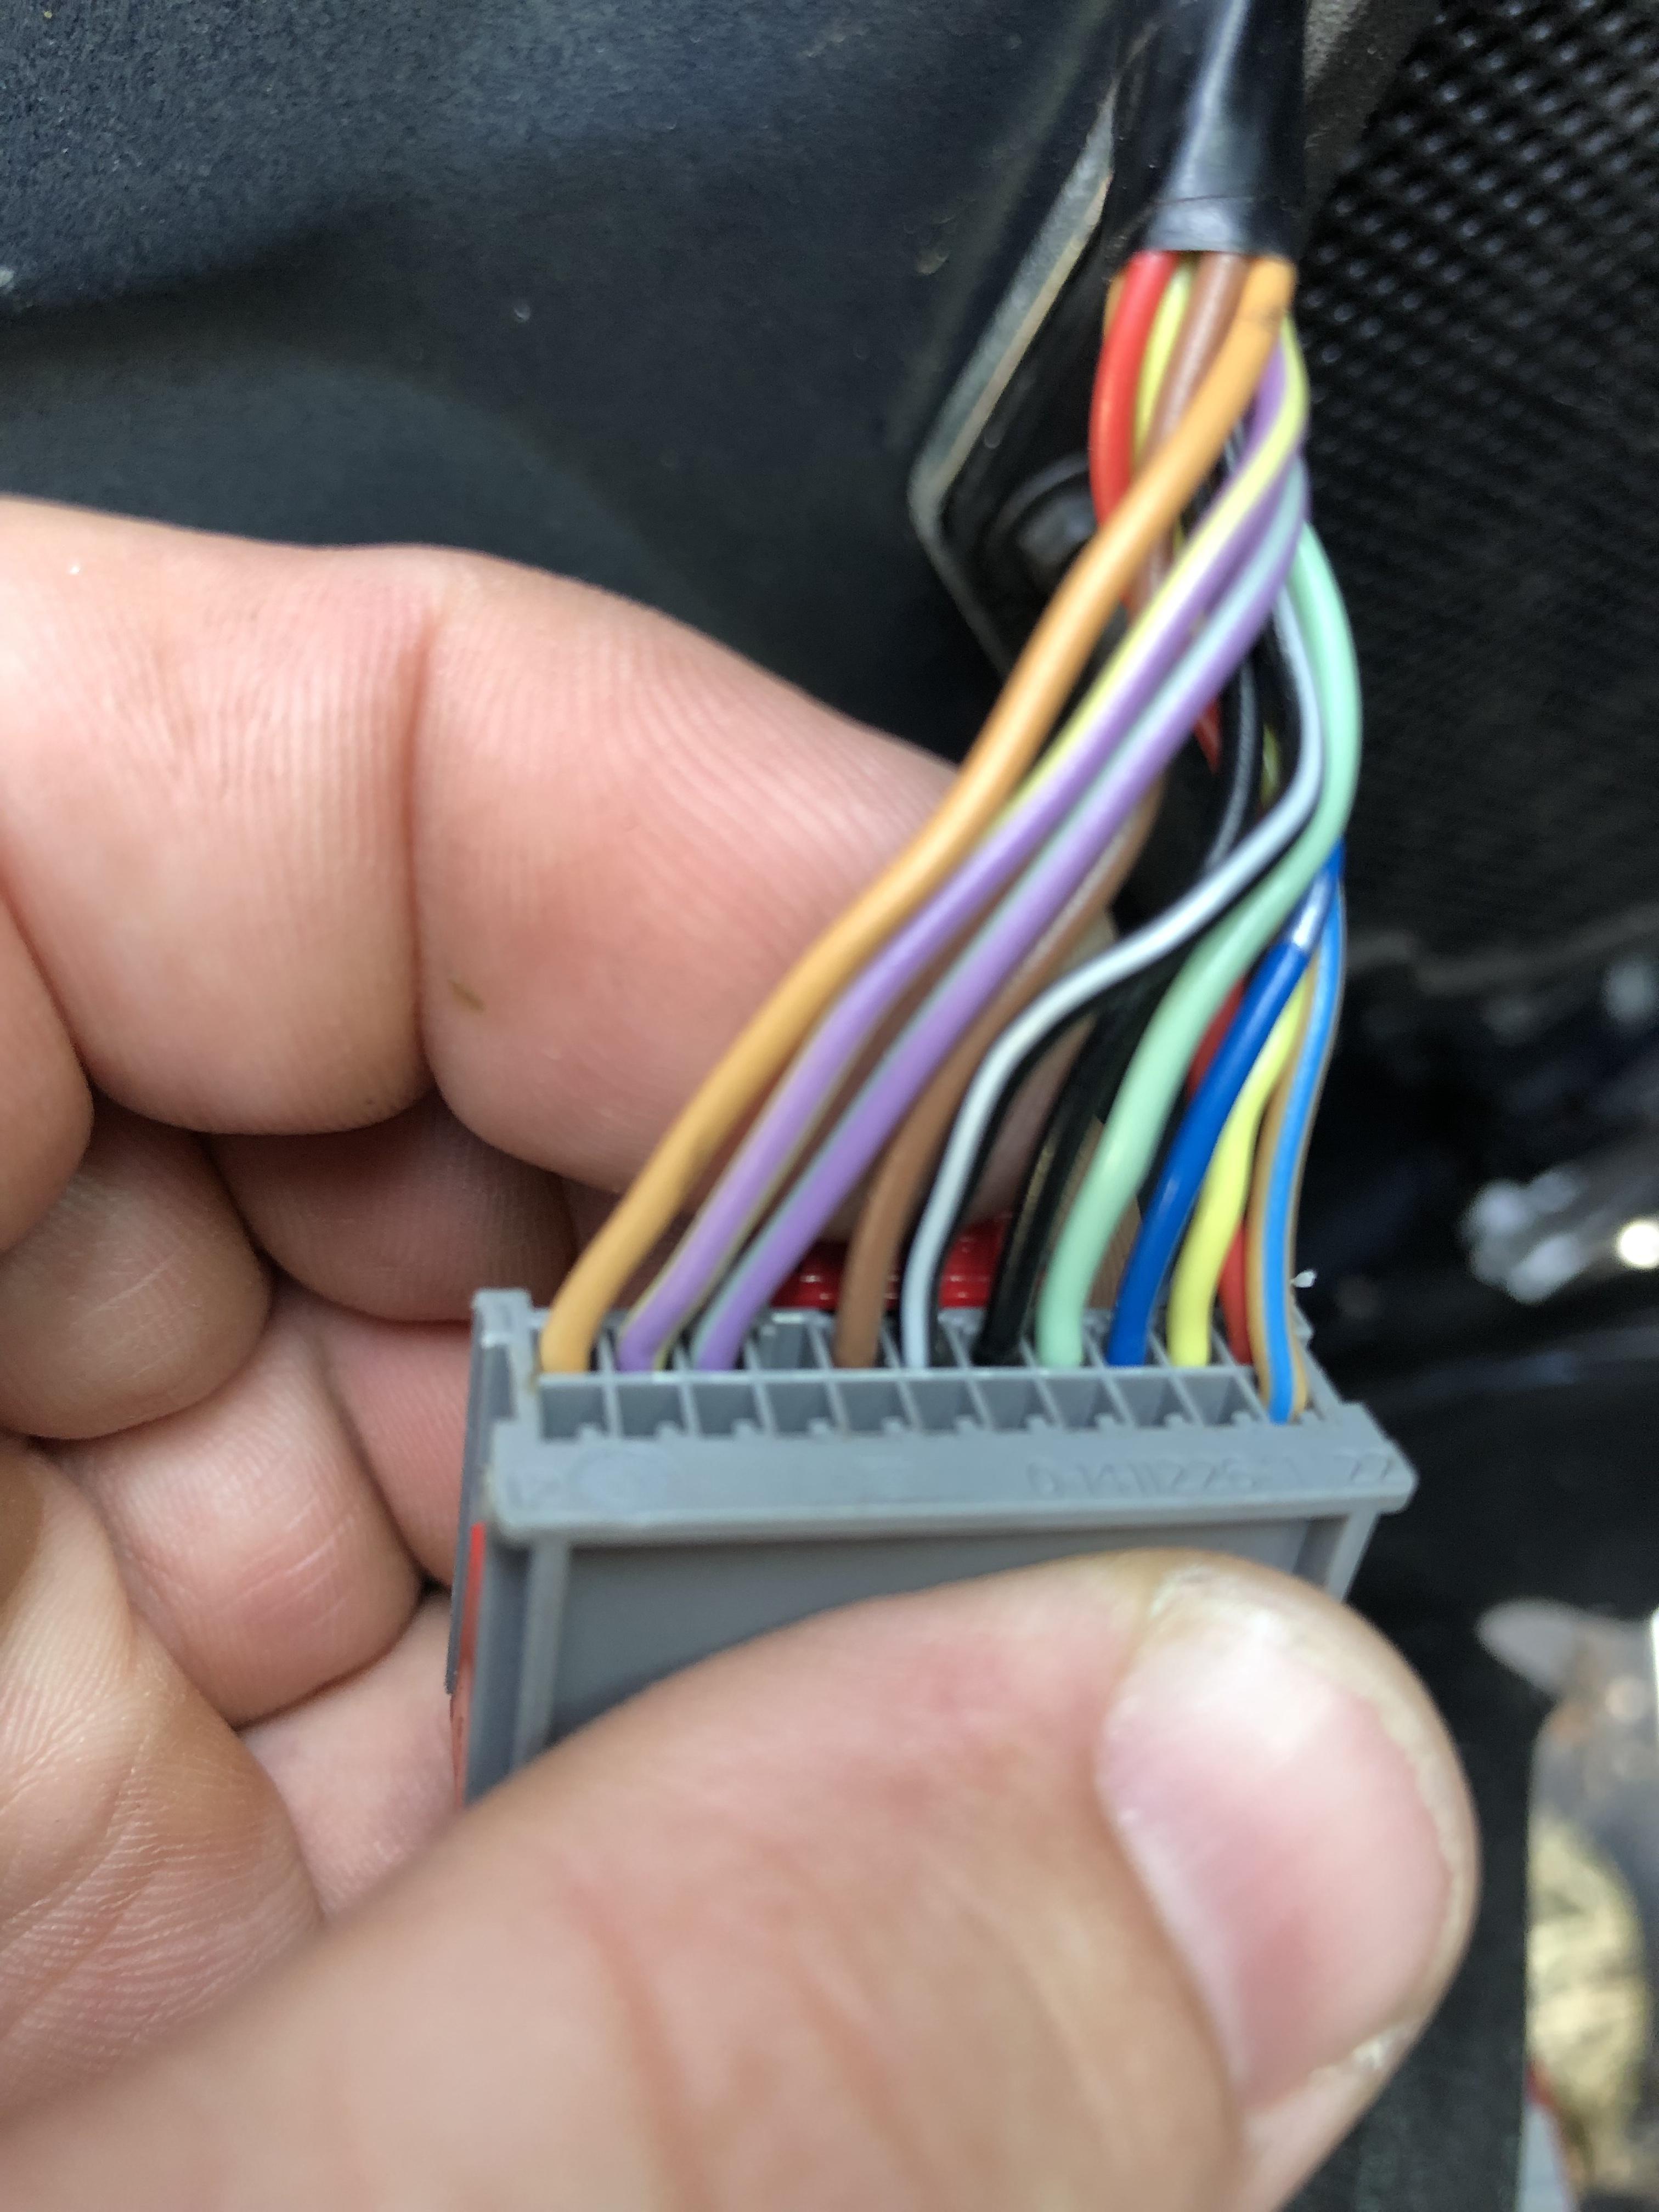 Ford F250 Mirror Wiring Diagram 480 Delta Wiring Diagram Bege Wiring Diagram